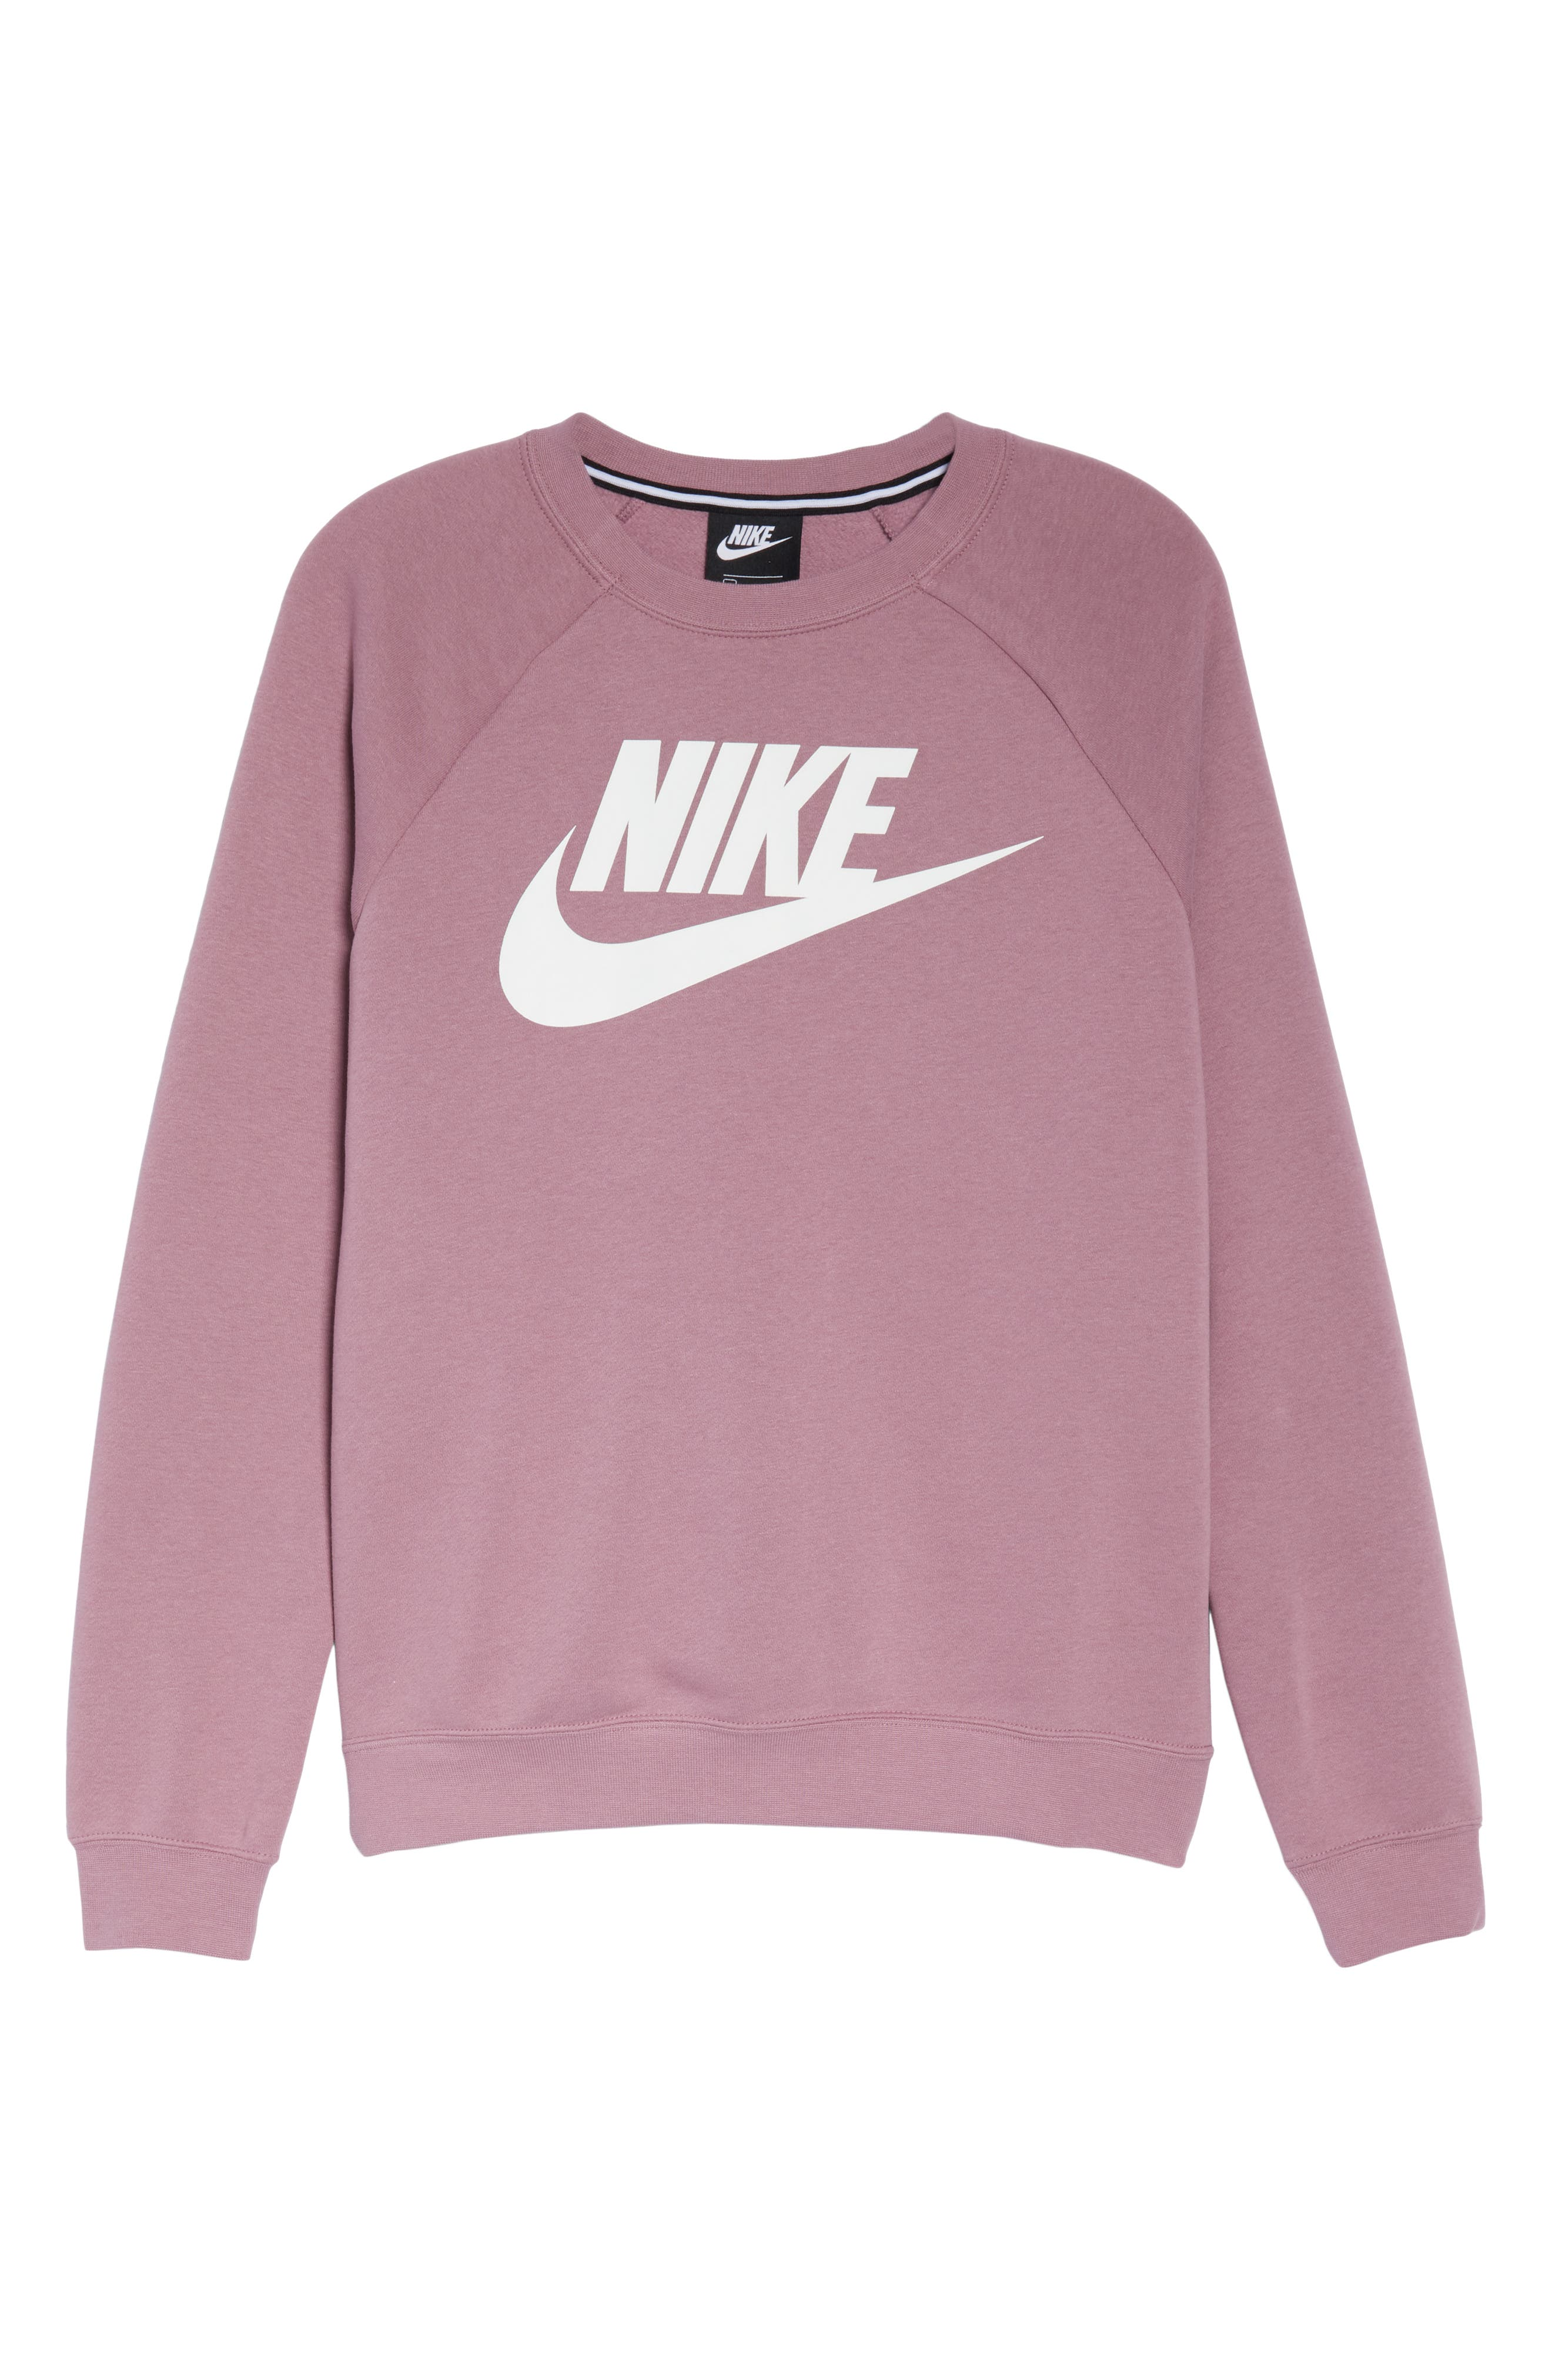 215a4635b8 Women s Nike Sweatshirts   Hoodies